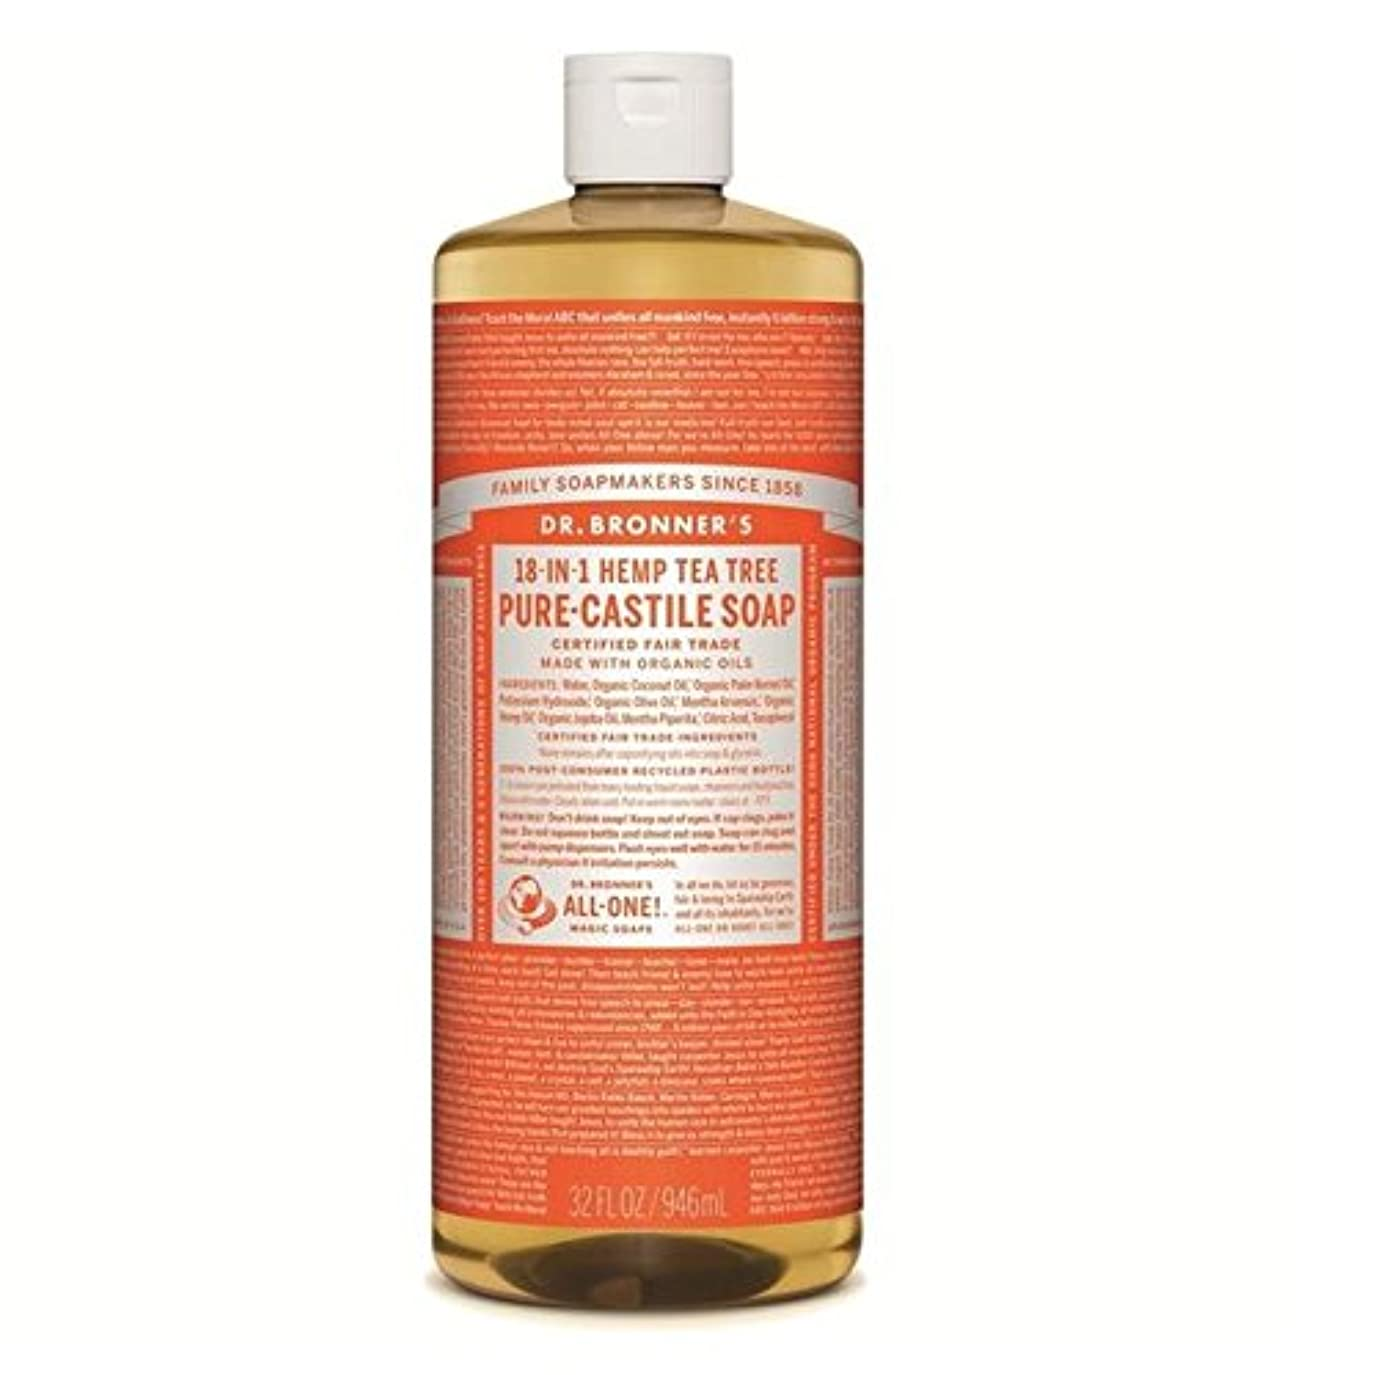 Dr Bronner Organic Tea Tree Castile Liquid Soap 946ml (Pack of 6) - のブロナーオーガニックティーツリーカスティーリャ液体石鹸946ミリリットル x6 [...